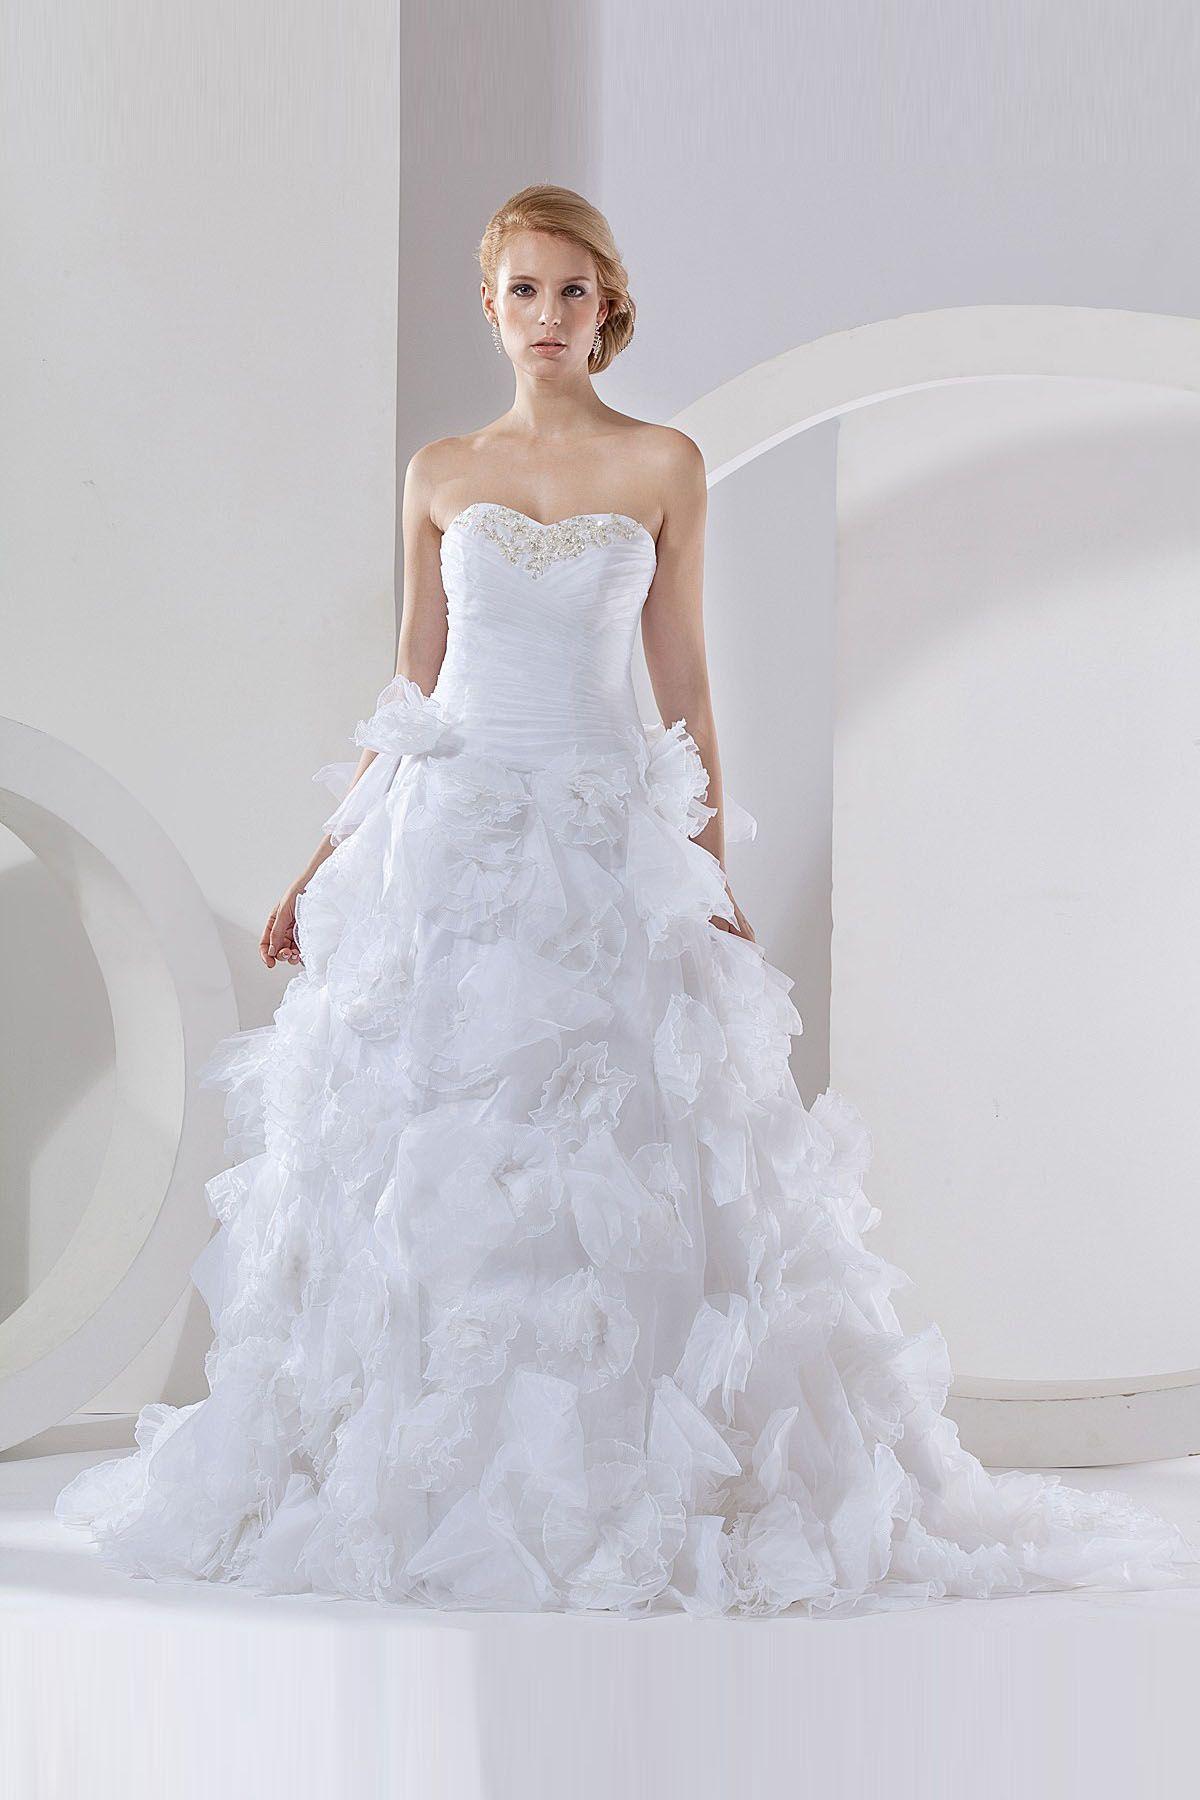 Sheath White Organza Chapel Train Sweetheart Wedding Dress